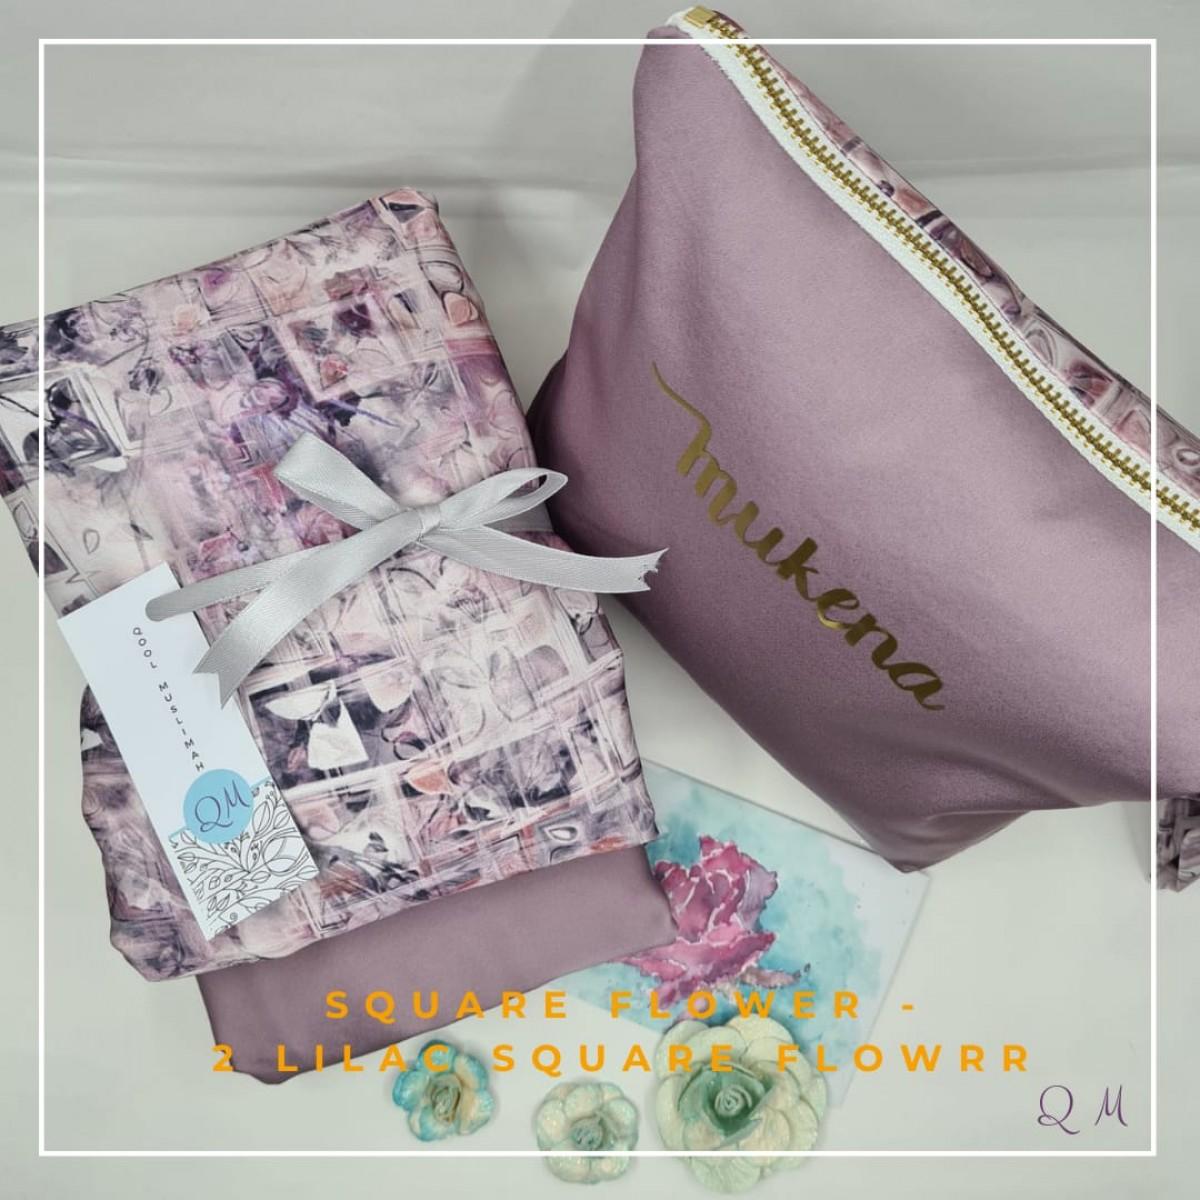 P8.Telekung/Mukena Armani Silk Square Floral-Lilac Square Floral - Qool Muslimah